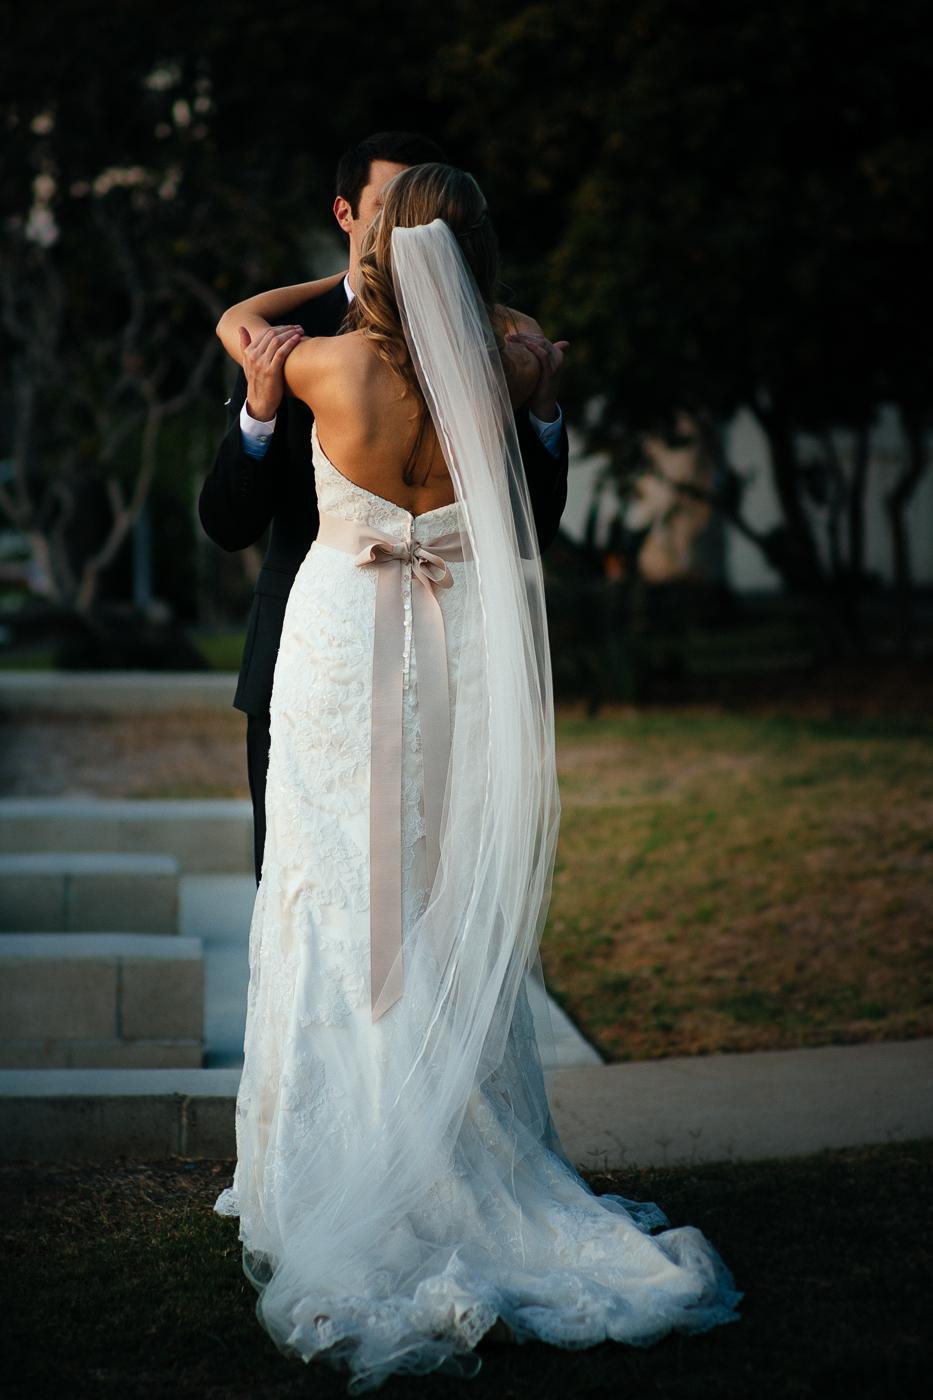 RYAN_&_KELLEY_DARLINGTON_HOUSE_WEDDING_2014_7X9A2511.JPG